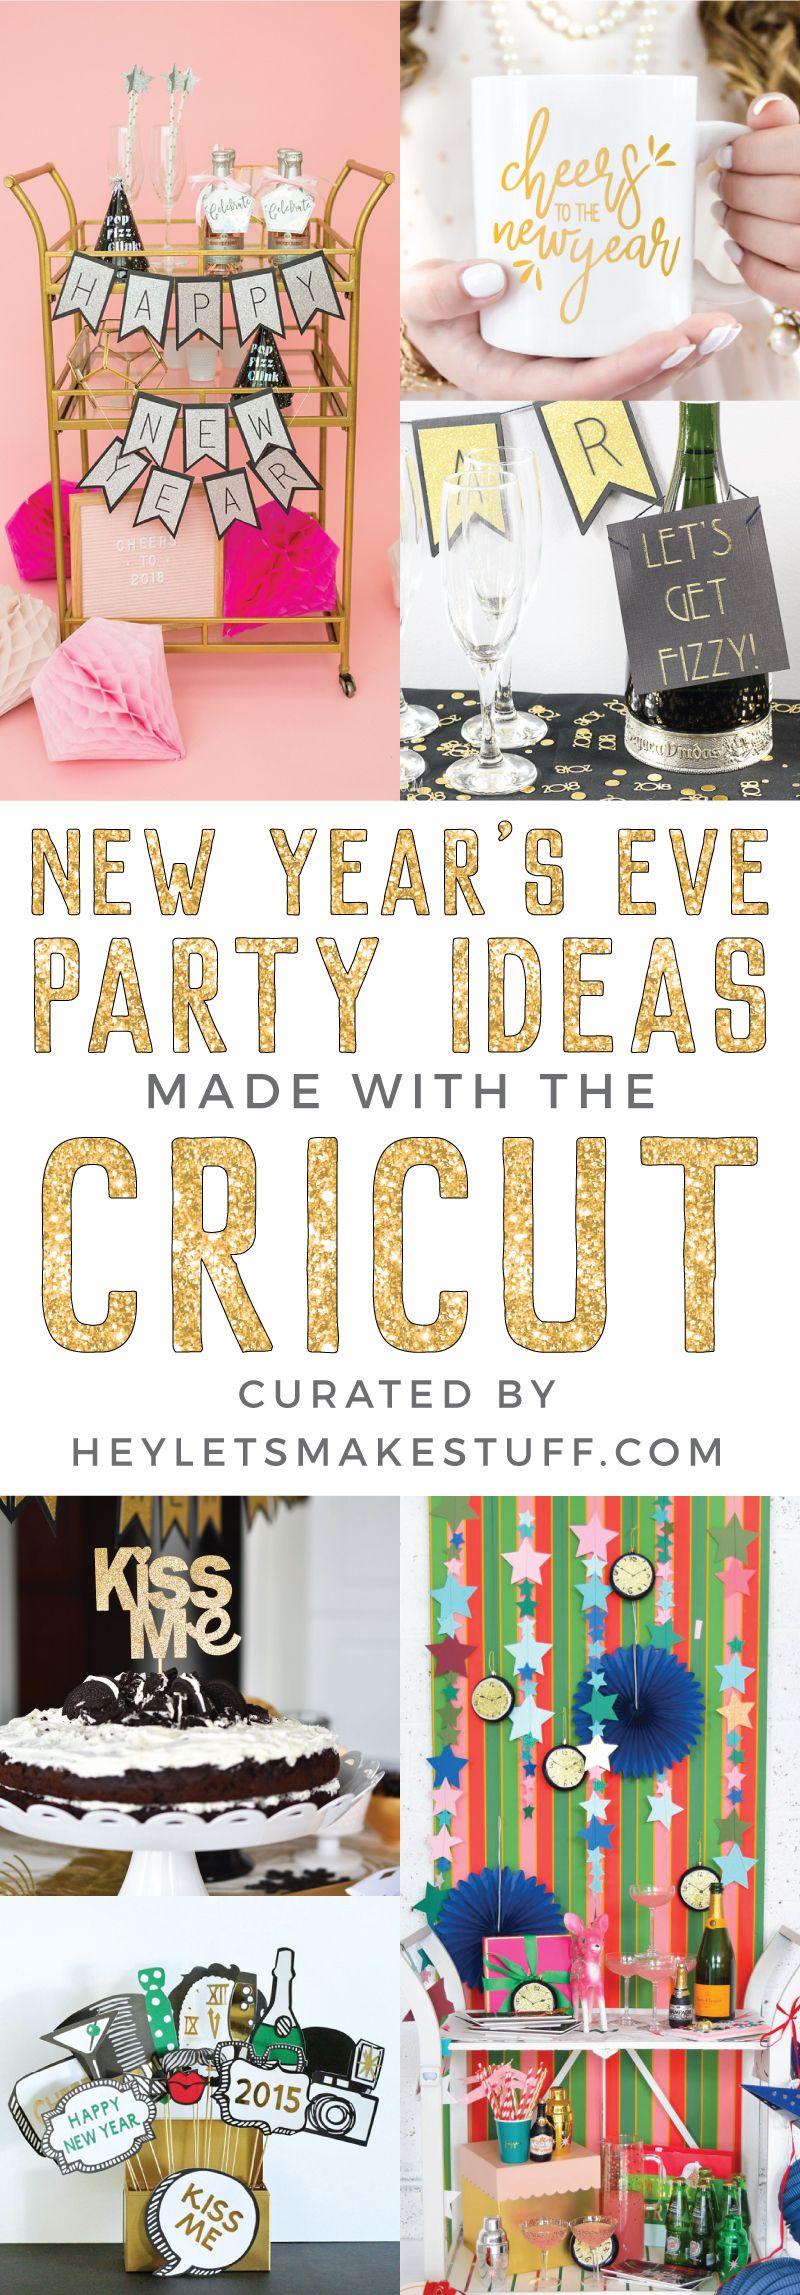 New Year S Eve Party Ideas With The Cricut Diy Holiday Party New Years Eve Party New Years Eve Decorations